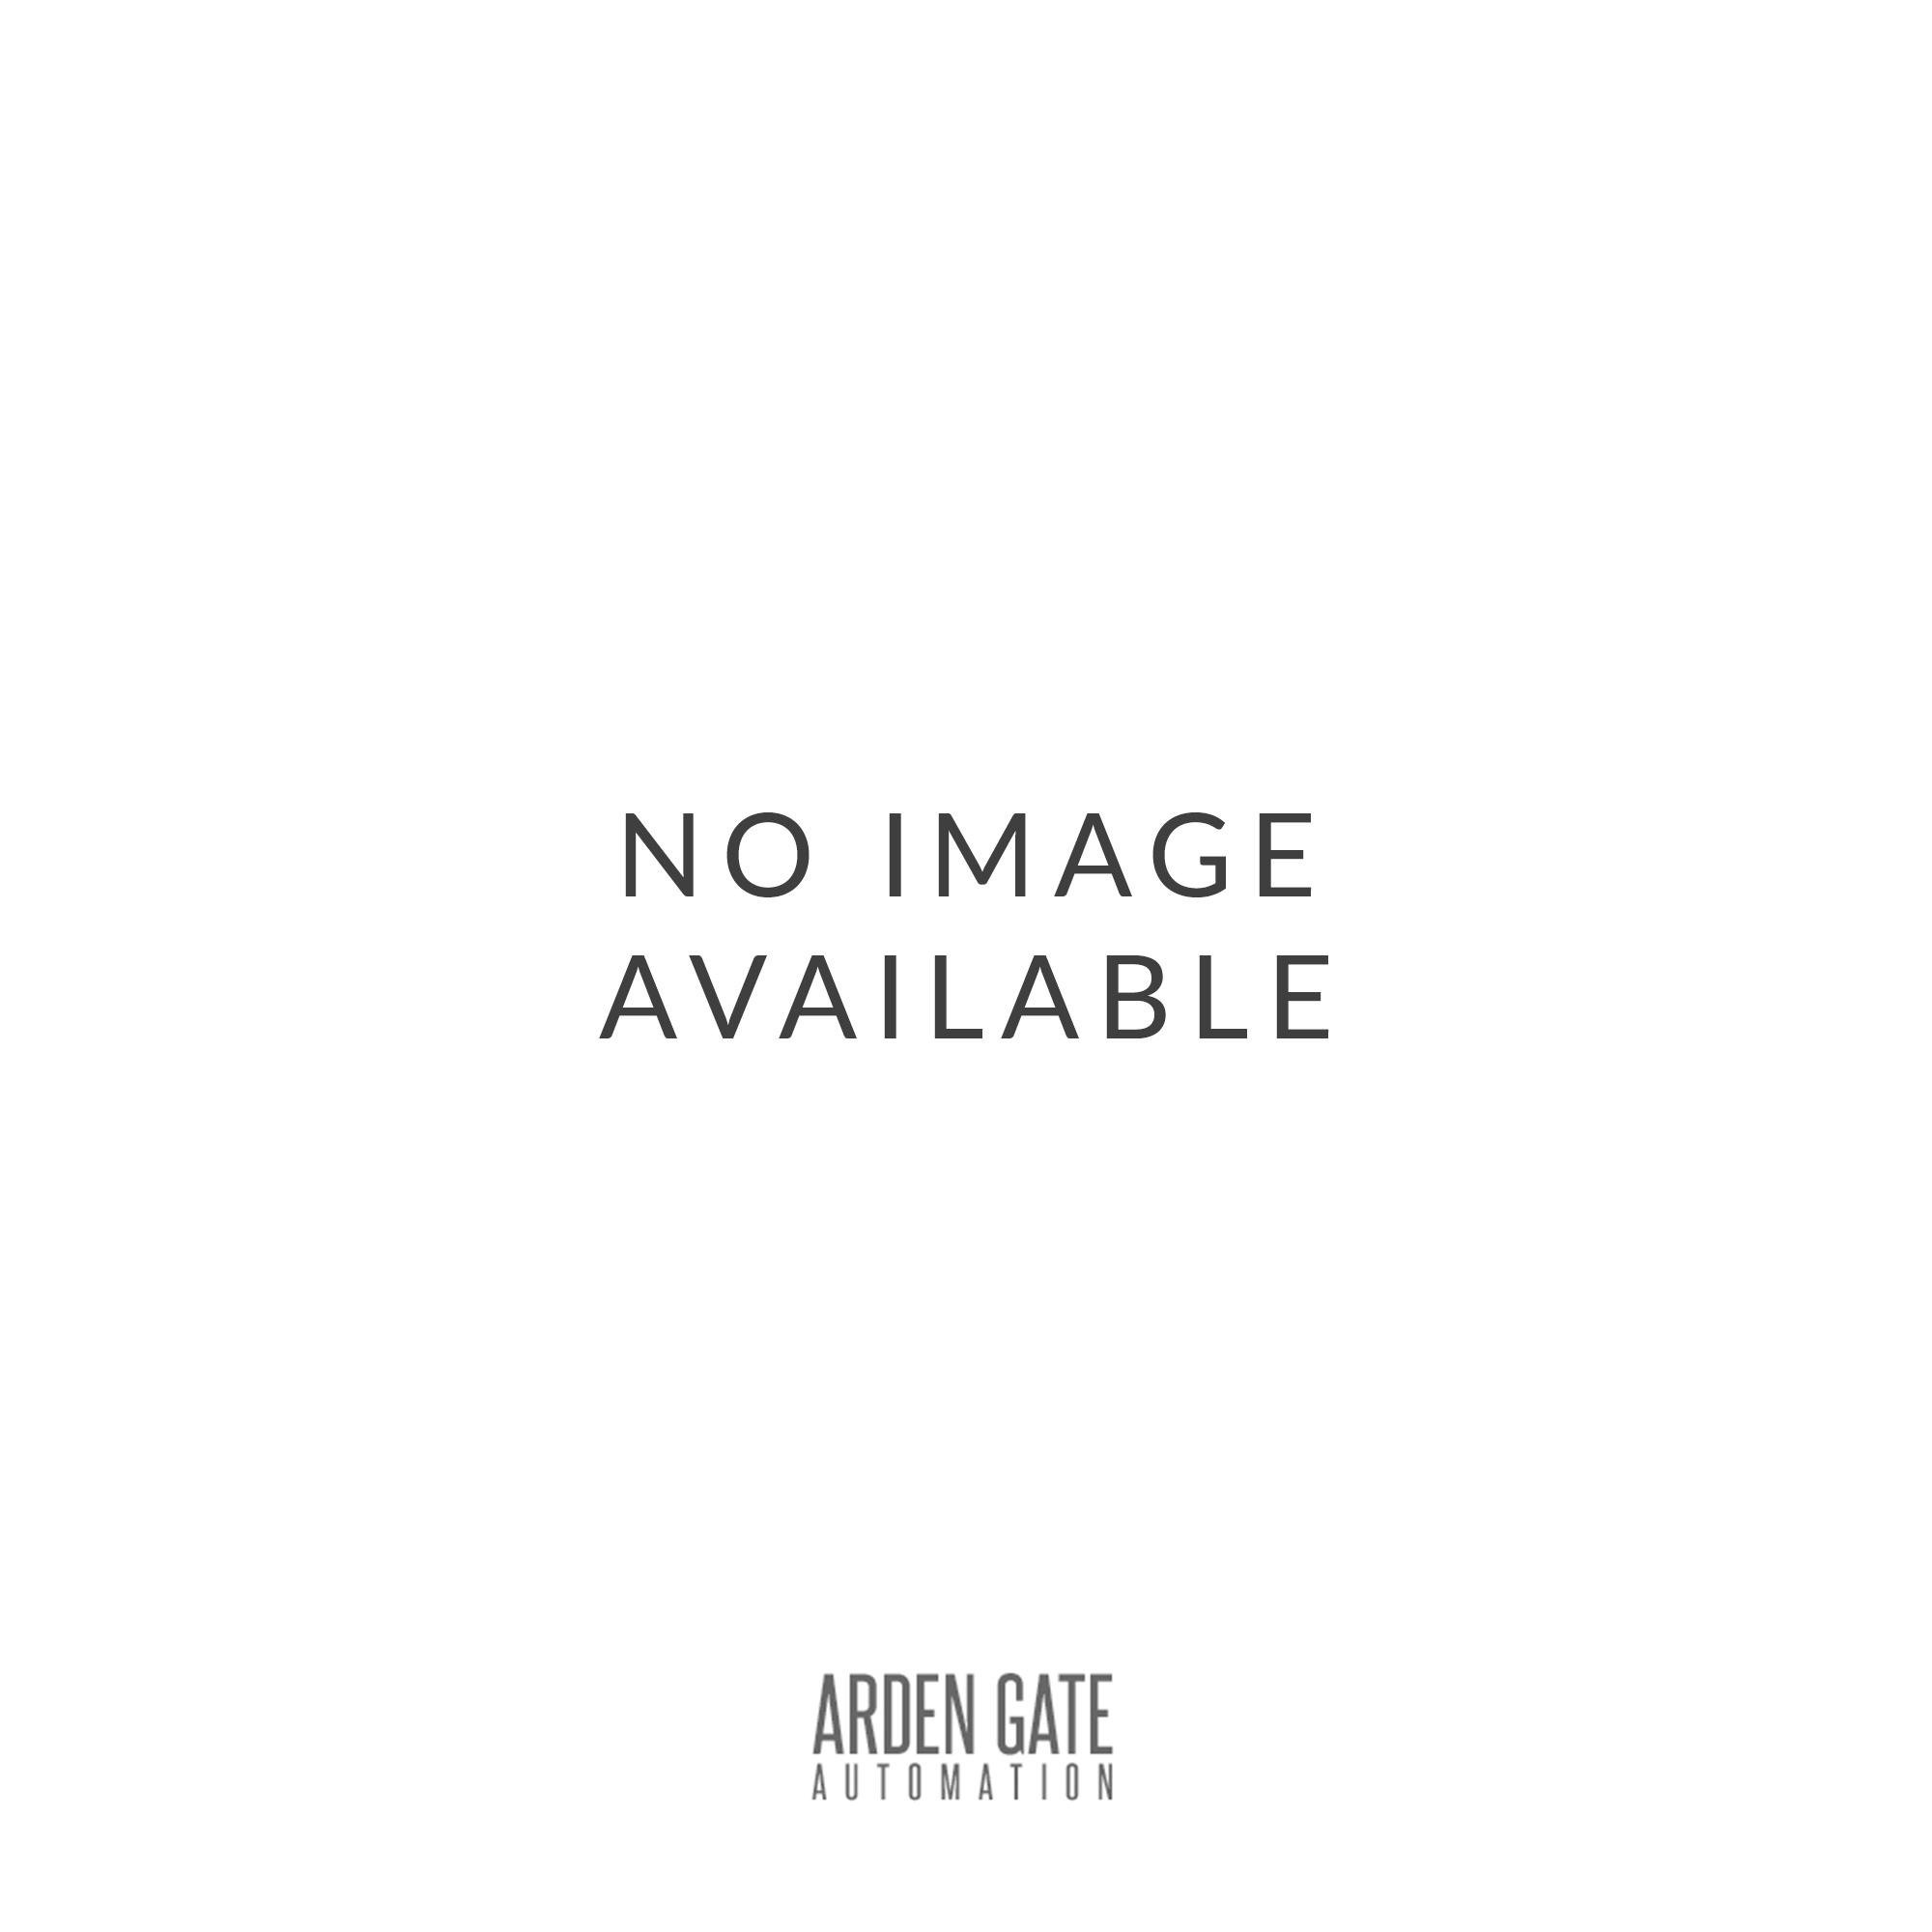 FAAC 578 D control board